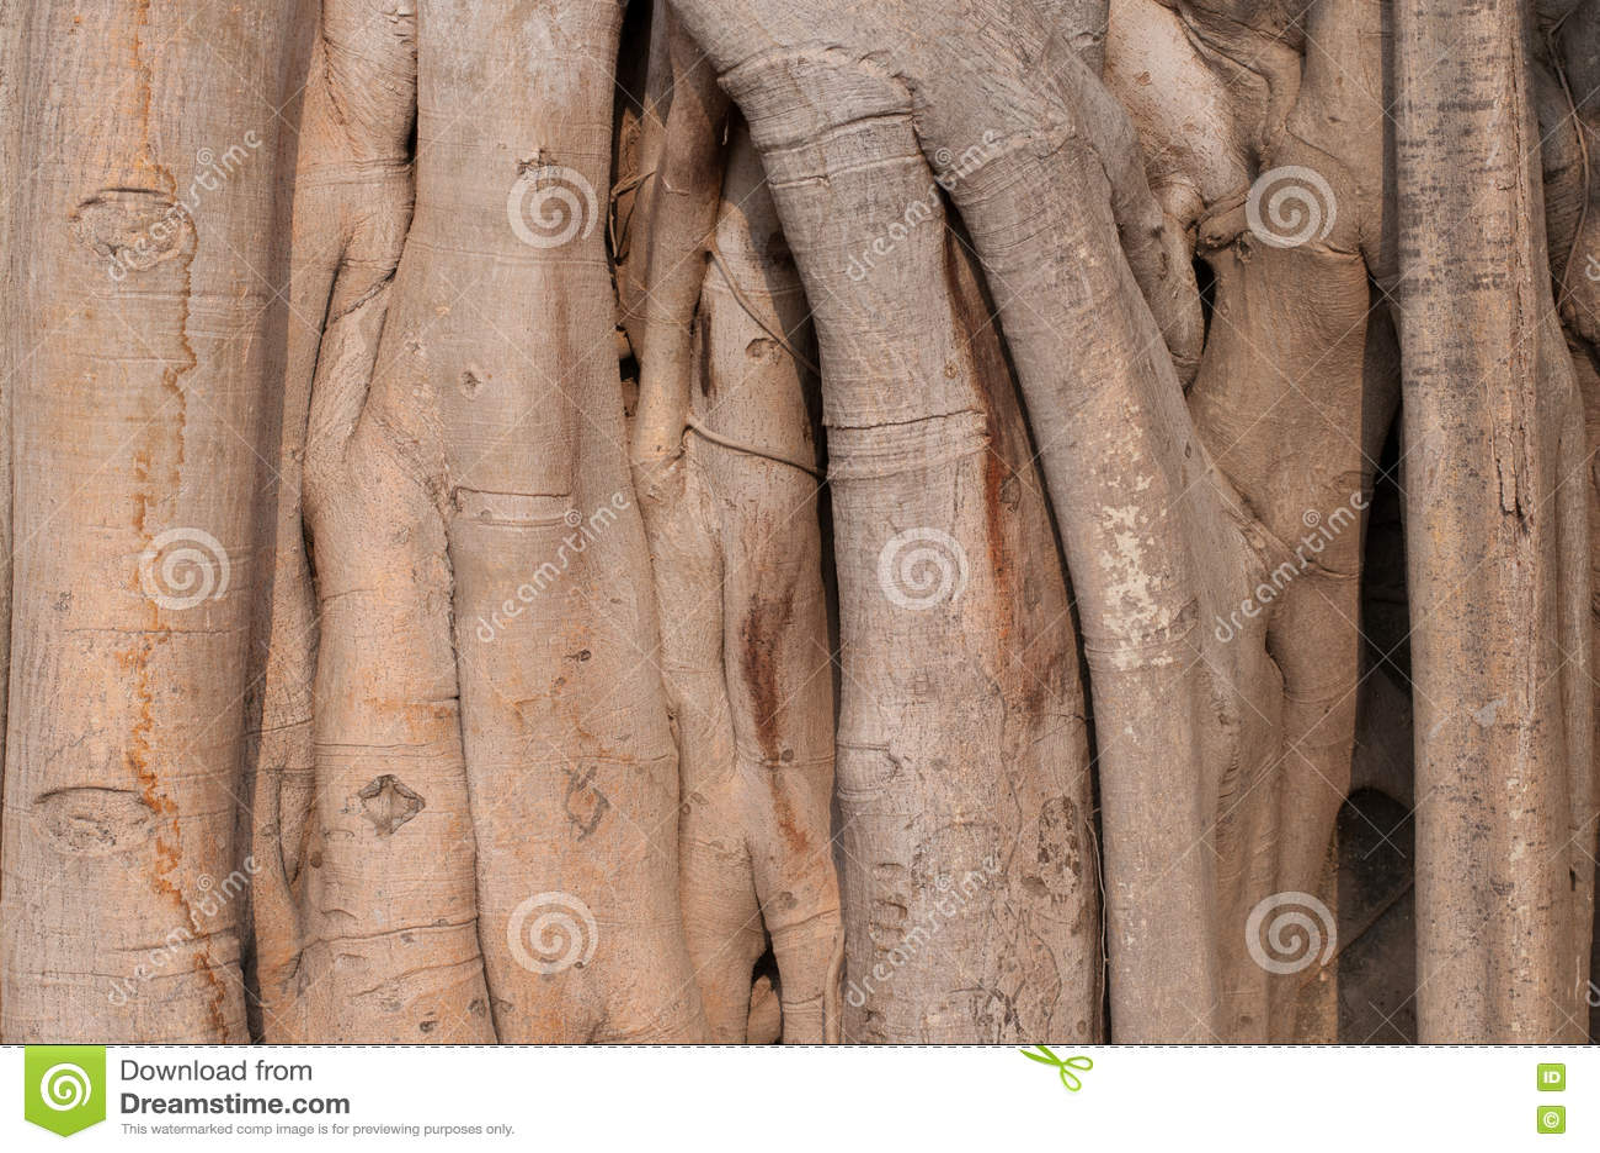 Bakstenen Binnenmuur Behandelen : Boomstamwortels die van ficus een bakstenen muur behandelen stock